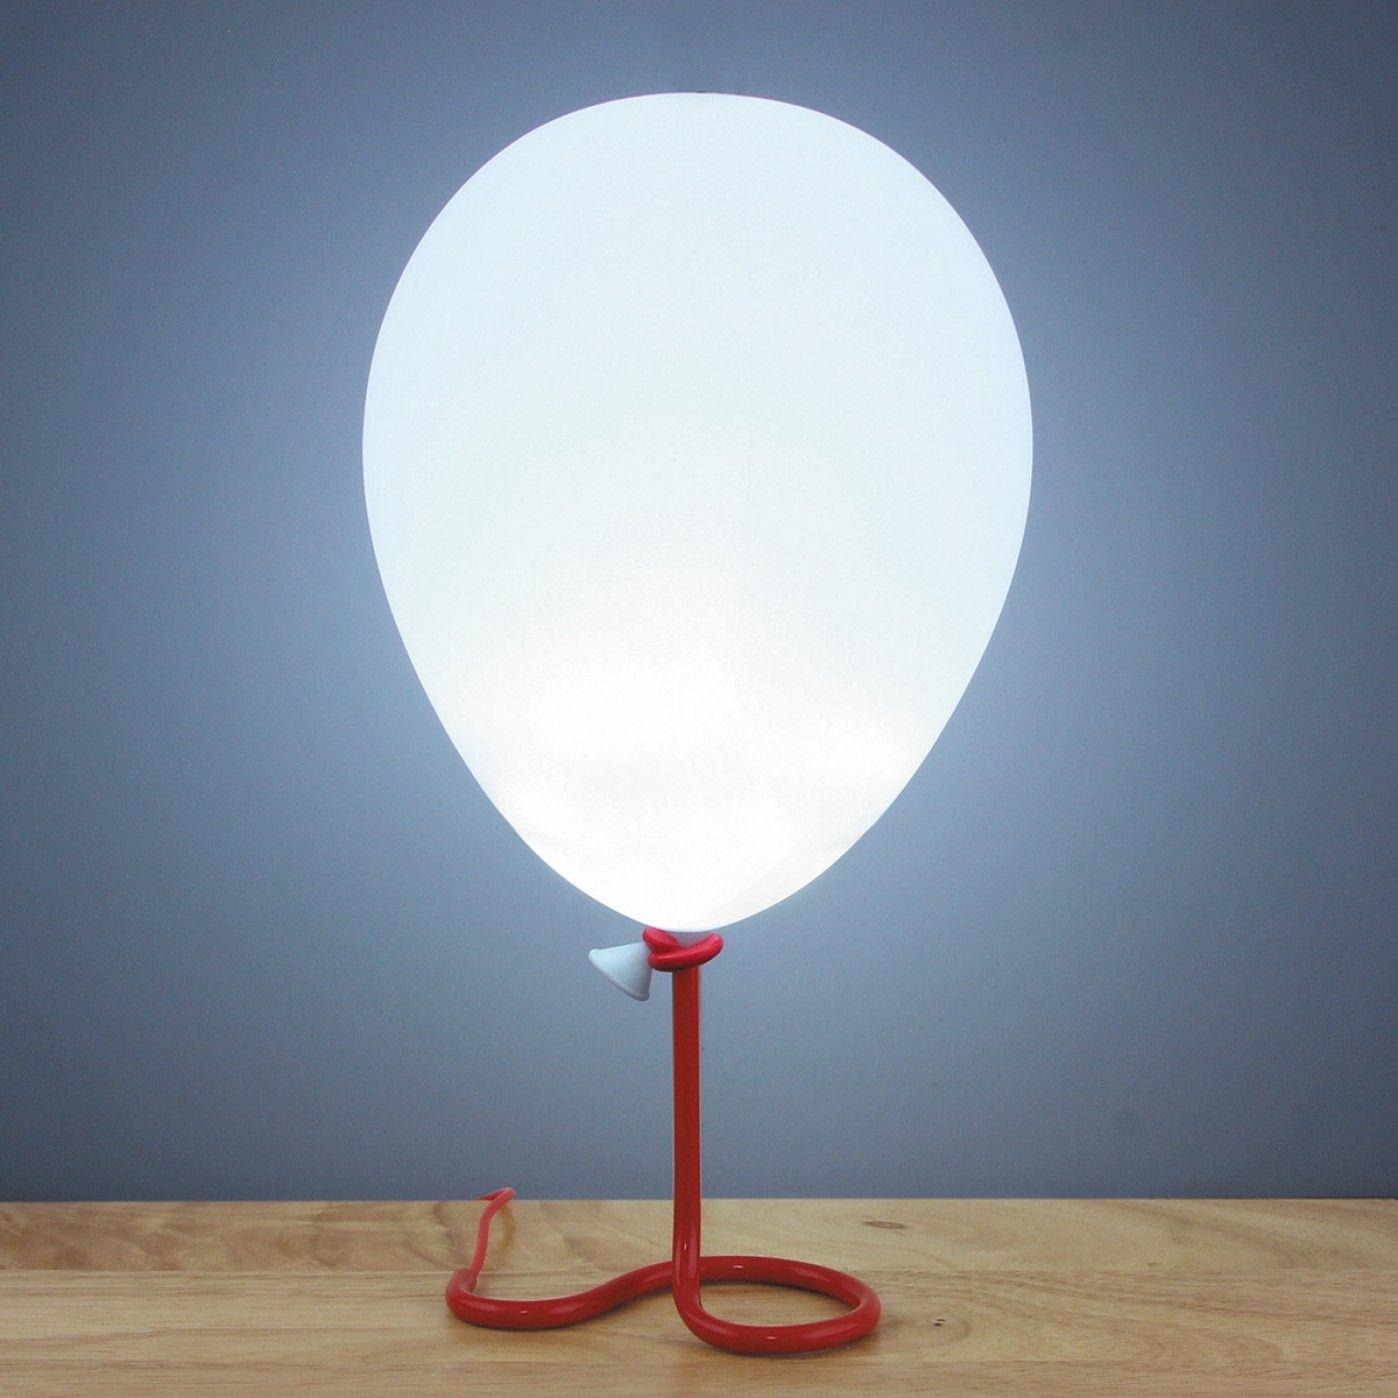 die besten 25 luftballon lampe ideen auf pinterest ballon lampe lampe selber machen. Black Bedroom Furniture Sets. Home Design Ideas